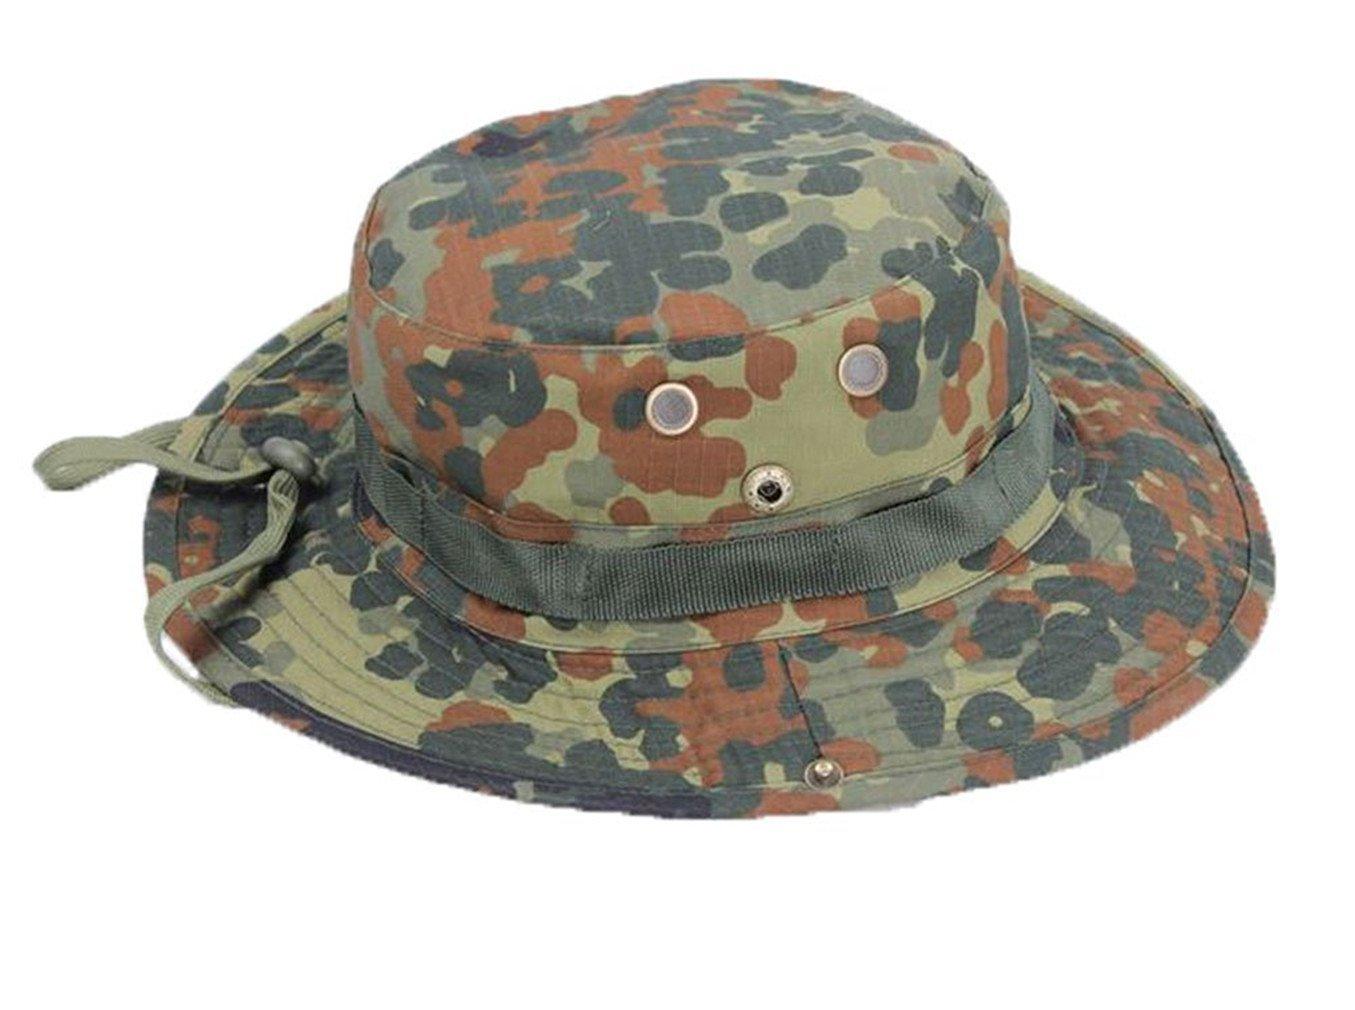 878d2b6e469d4 ... Activties (German Flecktarn). 4.4. null. Get Quotations · Herebuy8  Fashion Men Tactical Head Wear boonie Hat Camo Cap for Wargame